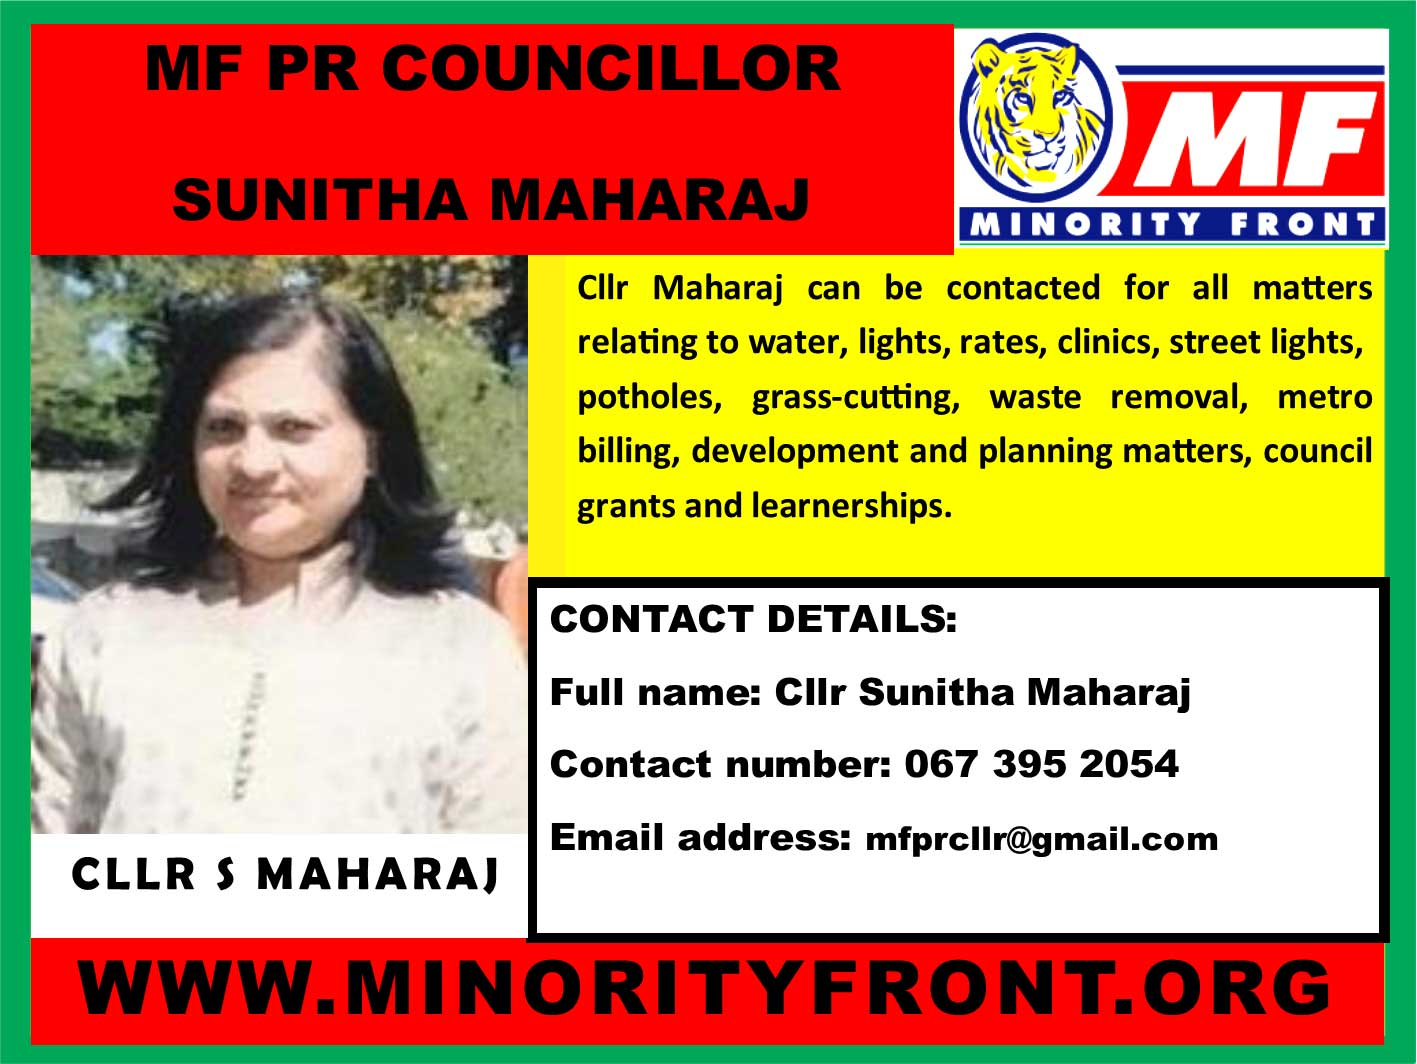 MF PR Councillor Sunitha Maharaj